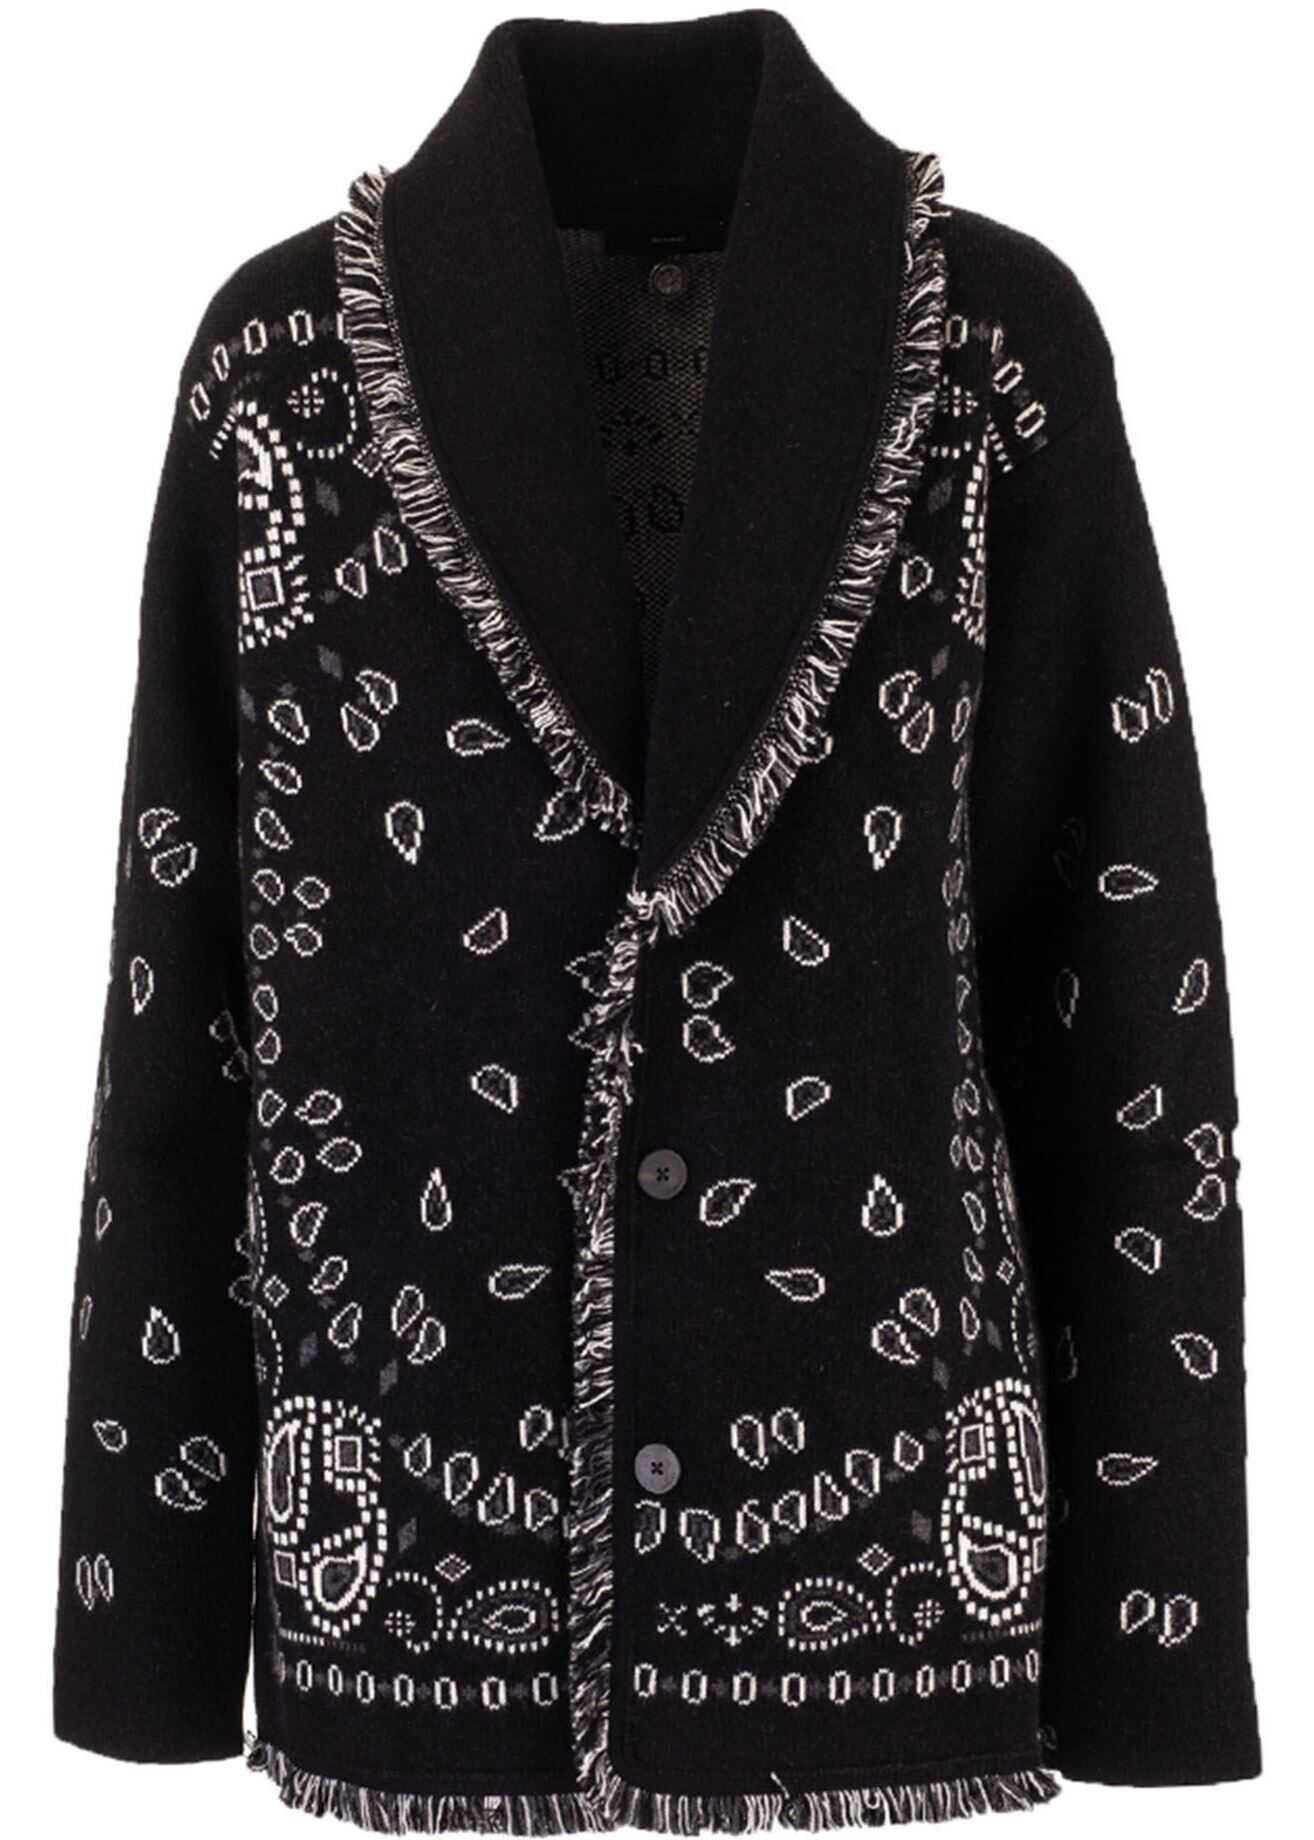 ALANUI Oversized Jacquard Cardigan In Black Black imagine